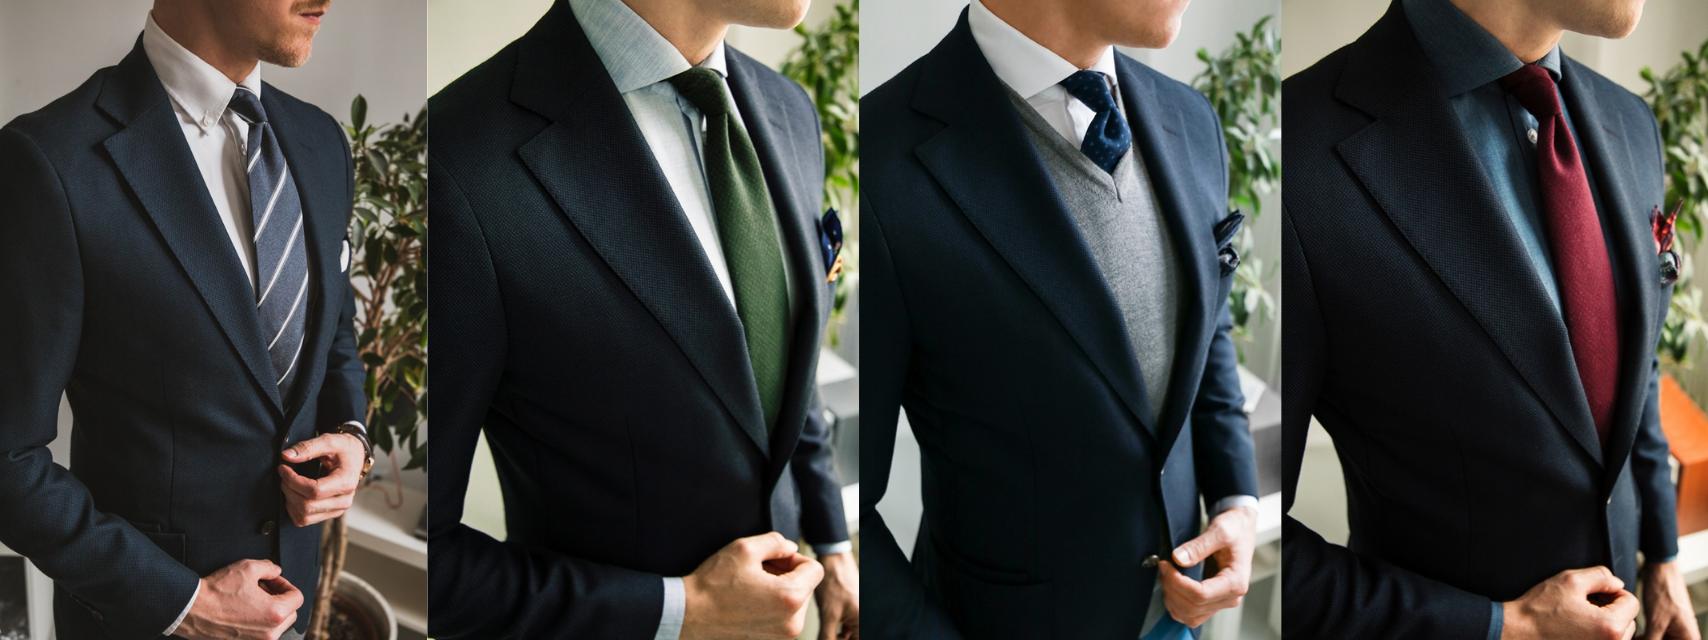 Krawaty kolaż